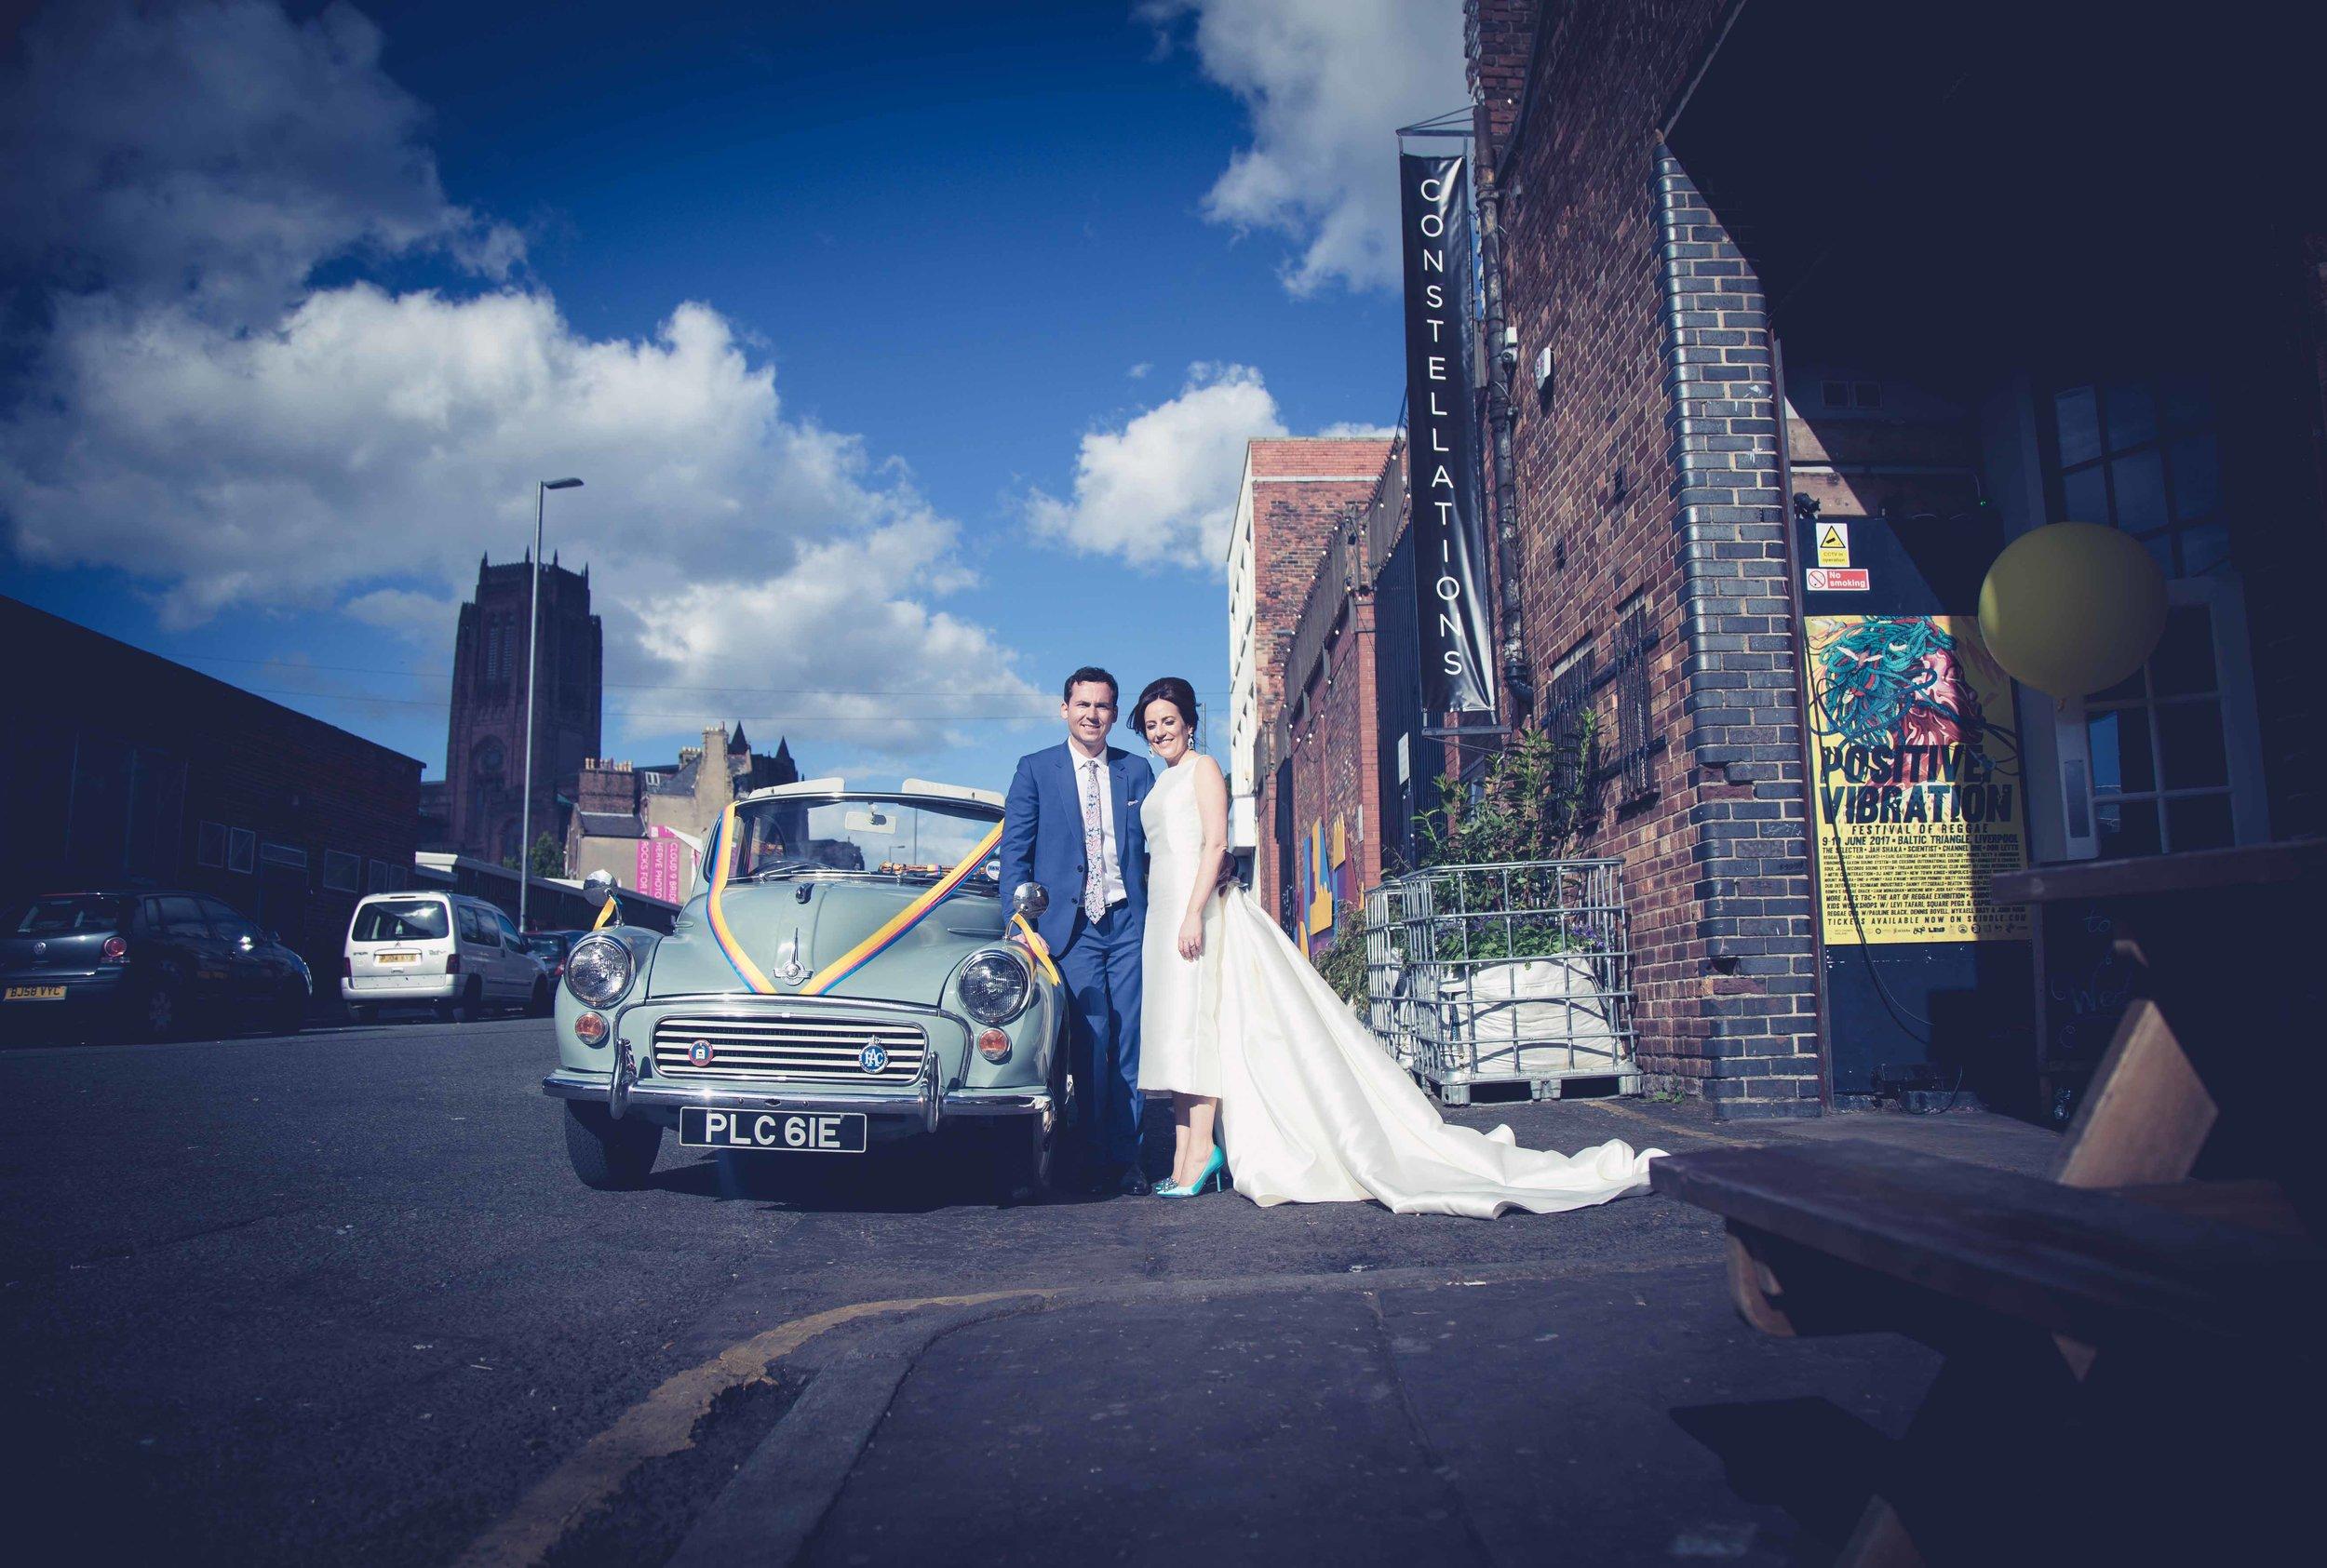 Hard days night wedding - Heather Elizabeth Photography (1 of 1)-56.jpg